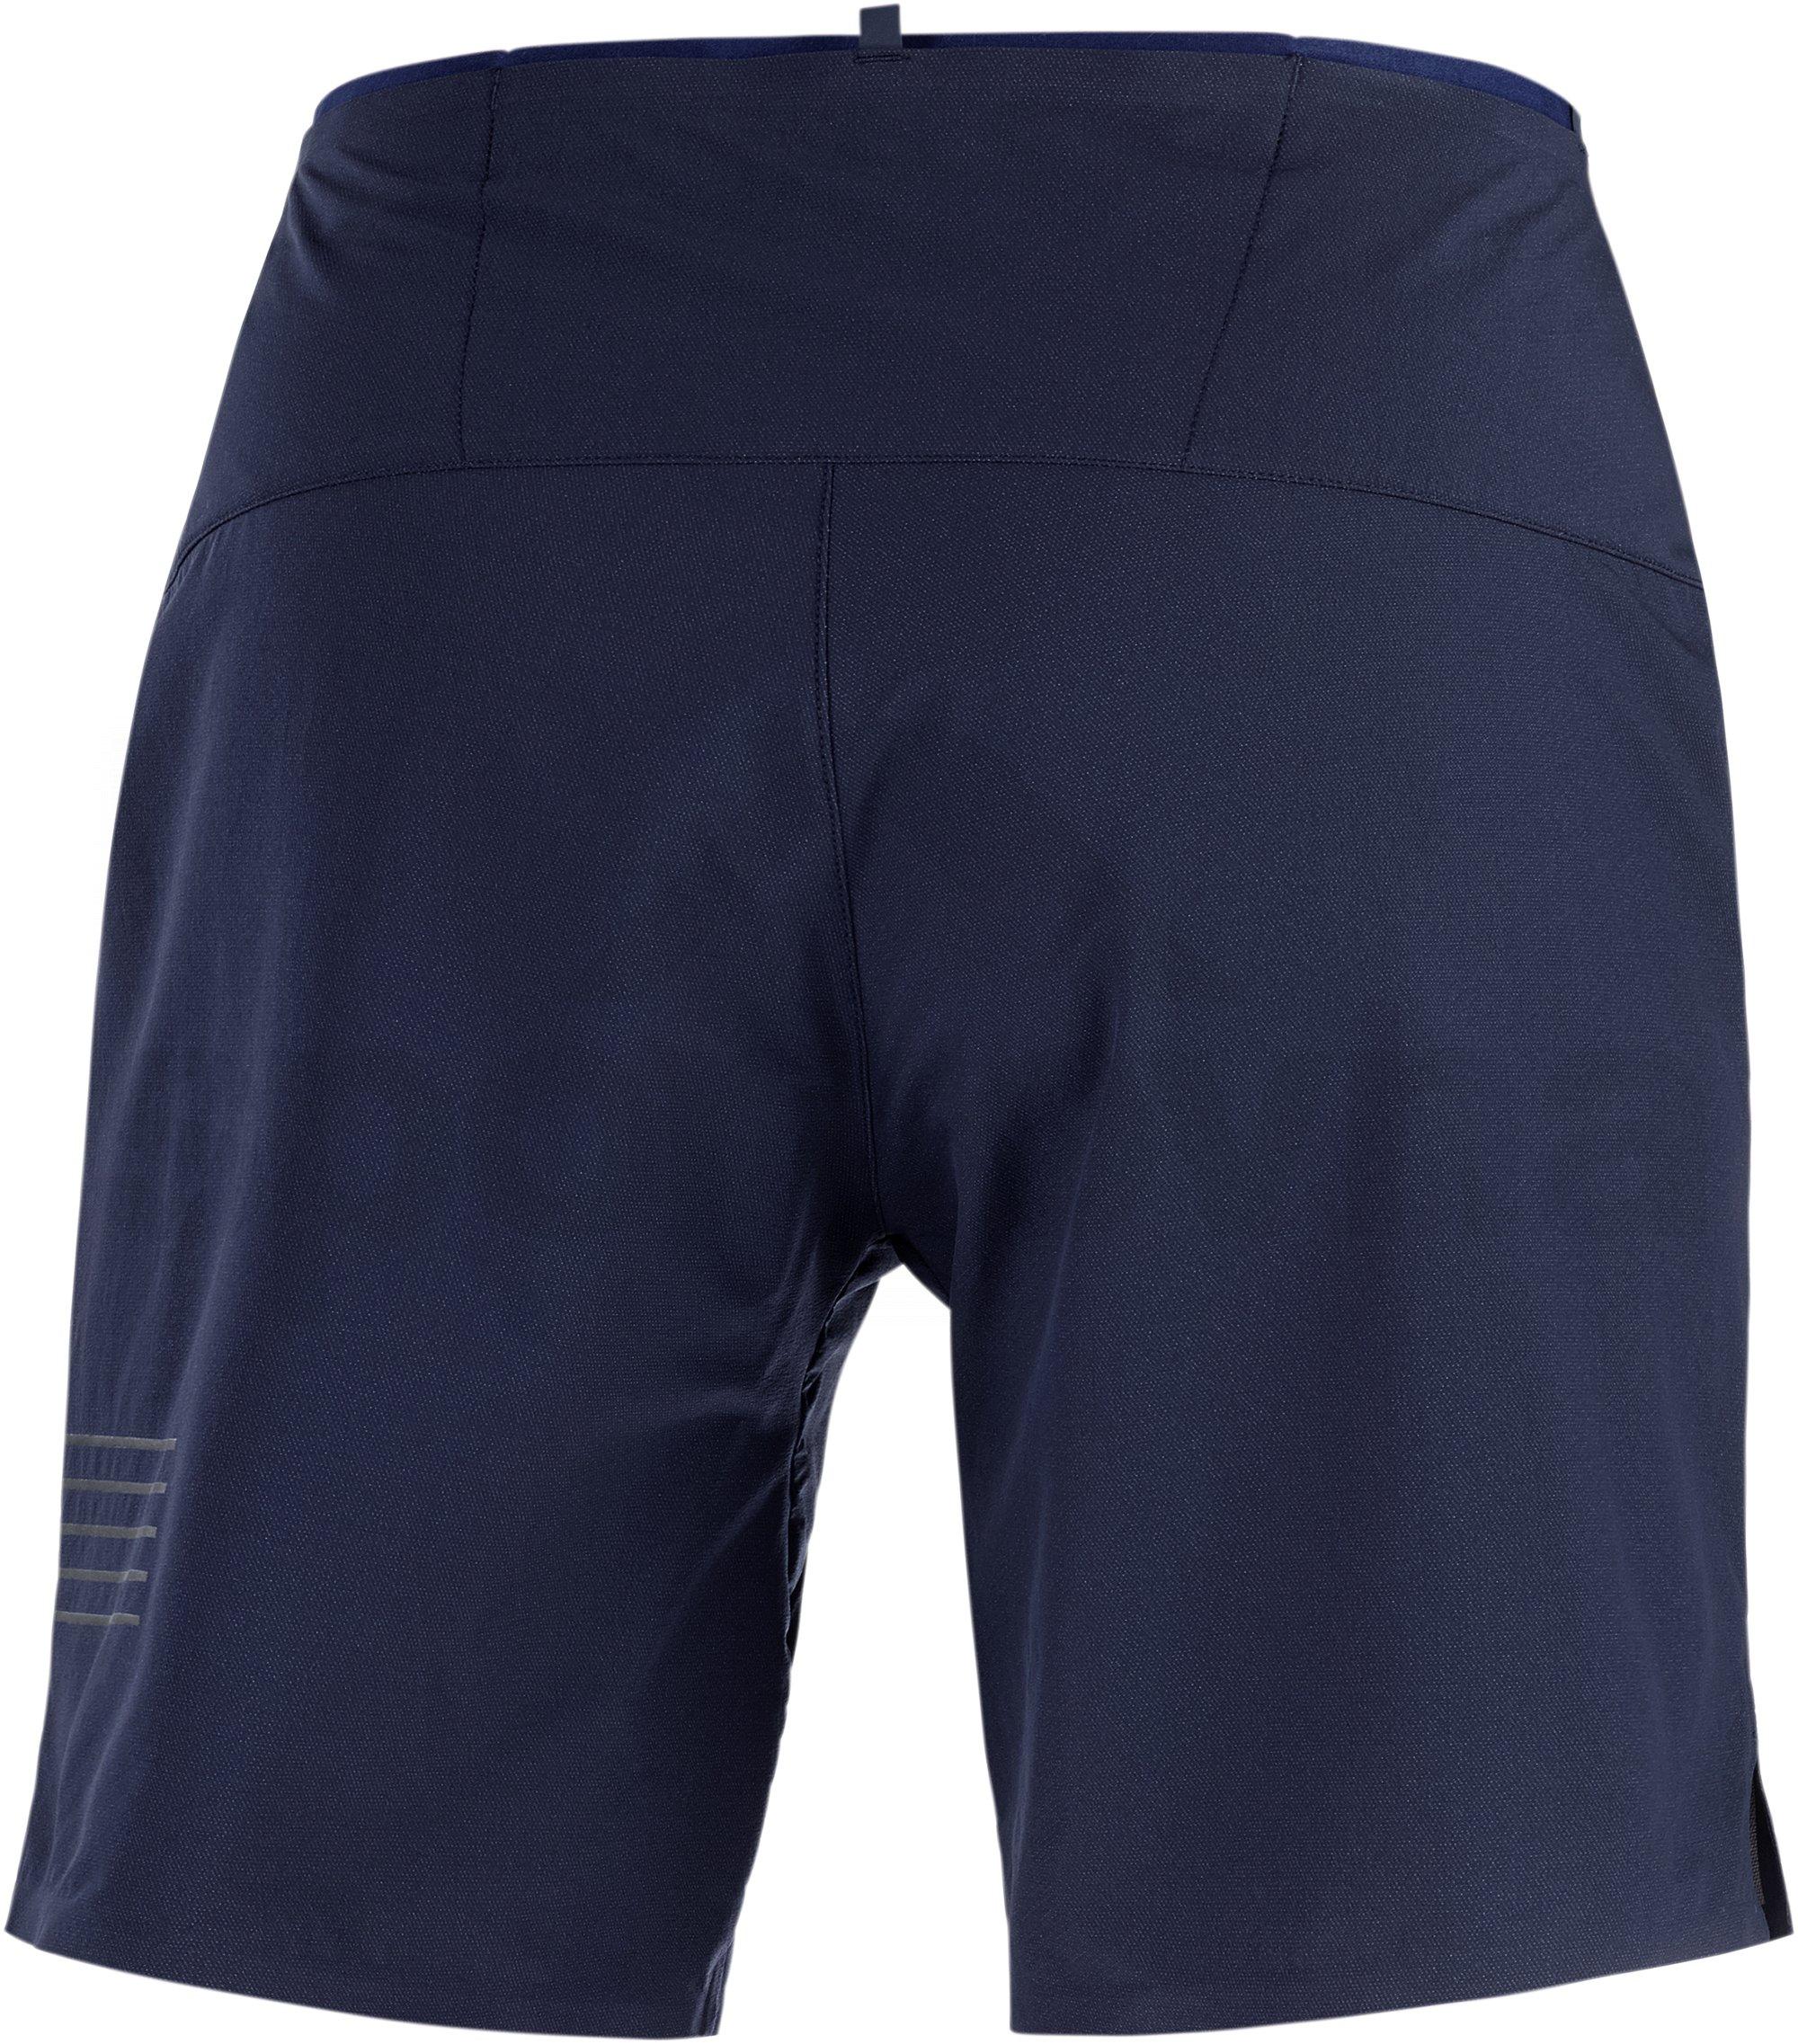 Kraťasy Salomon Outspeed Shorts W - modrá